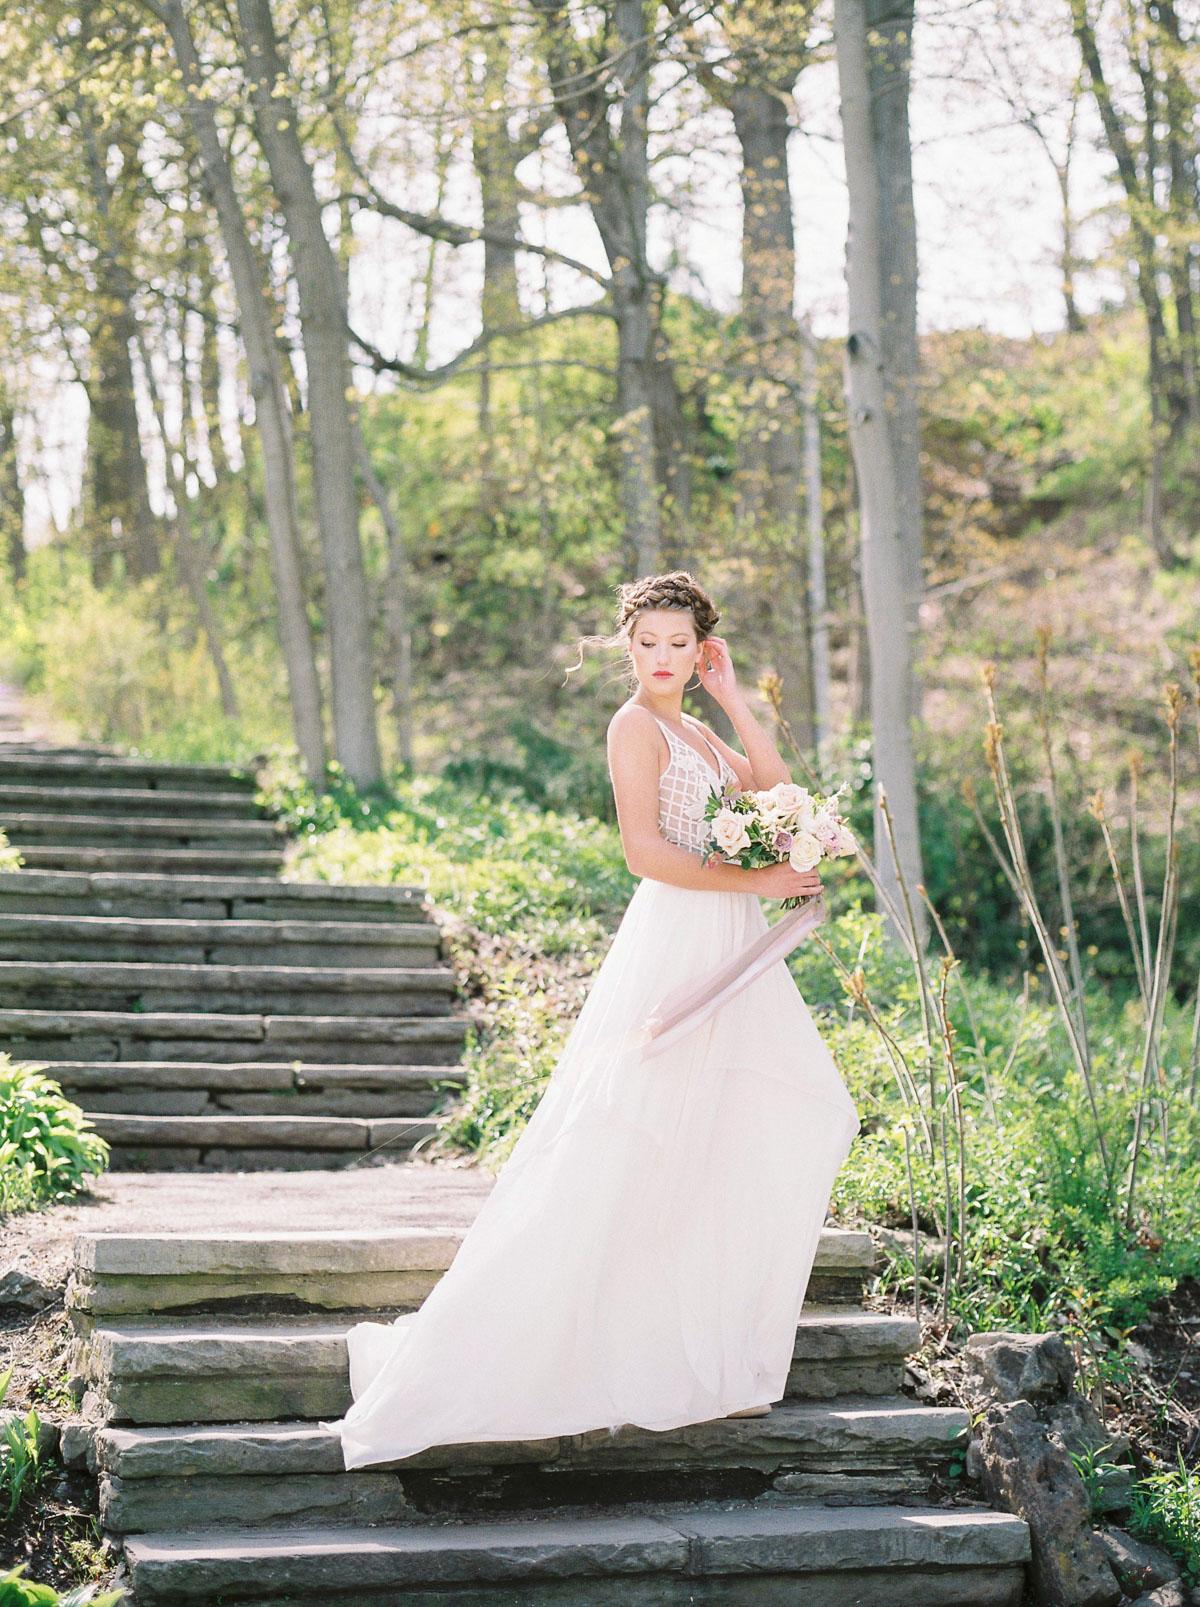 julia-park-photography-vineyard-bride-swish-list-niagara-on-the-lake-wedding-editorial-1.jpg